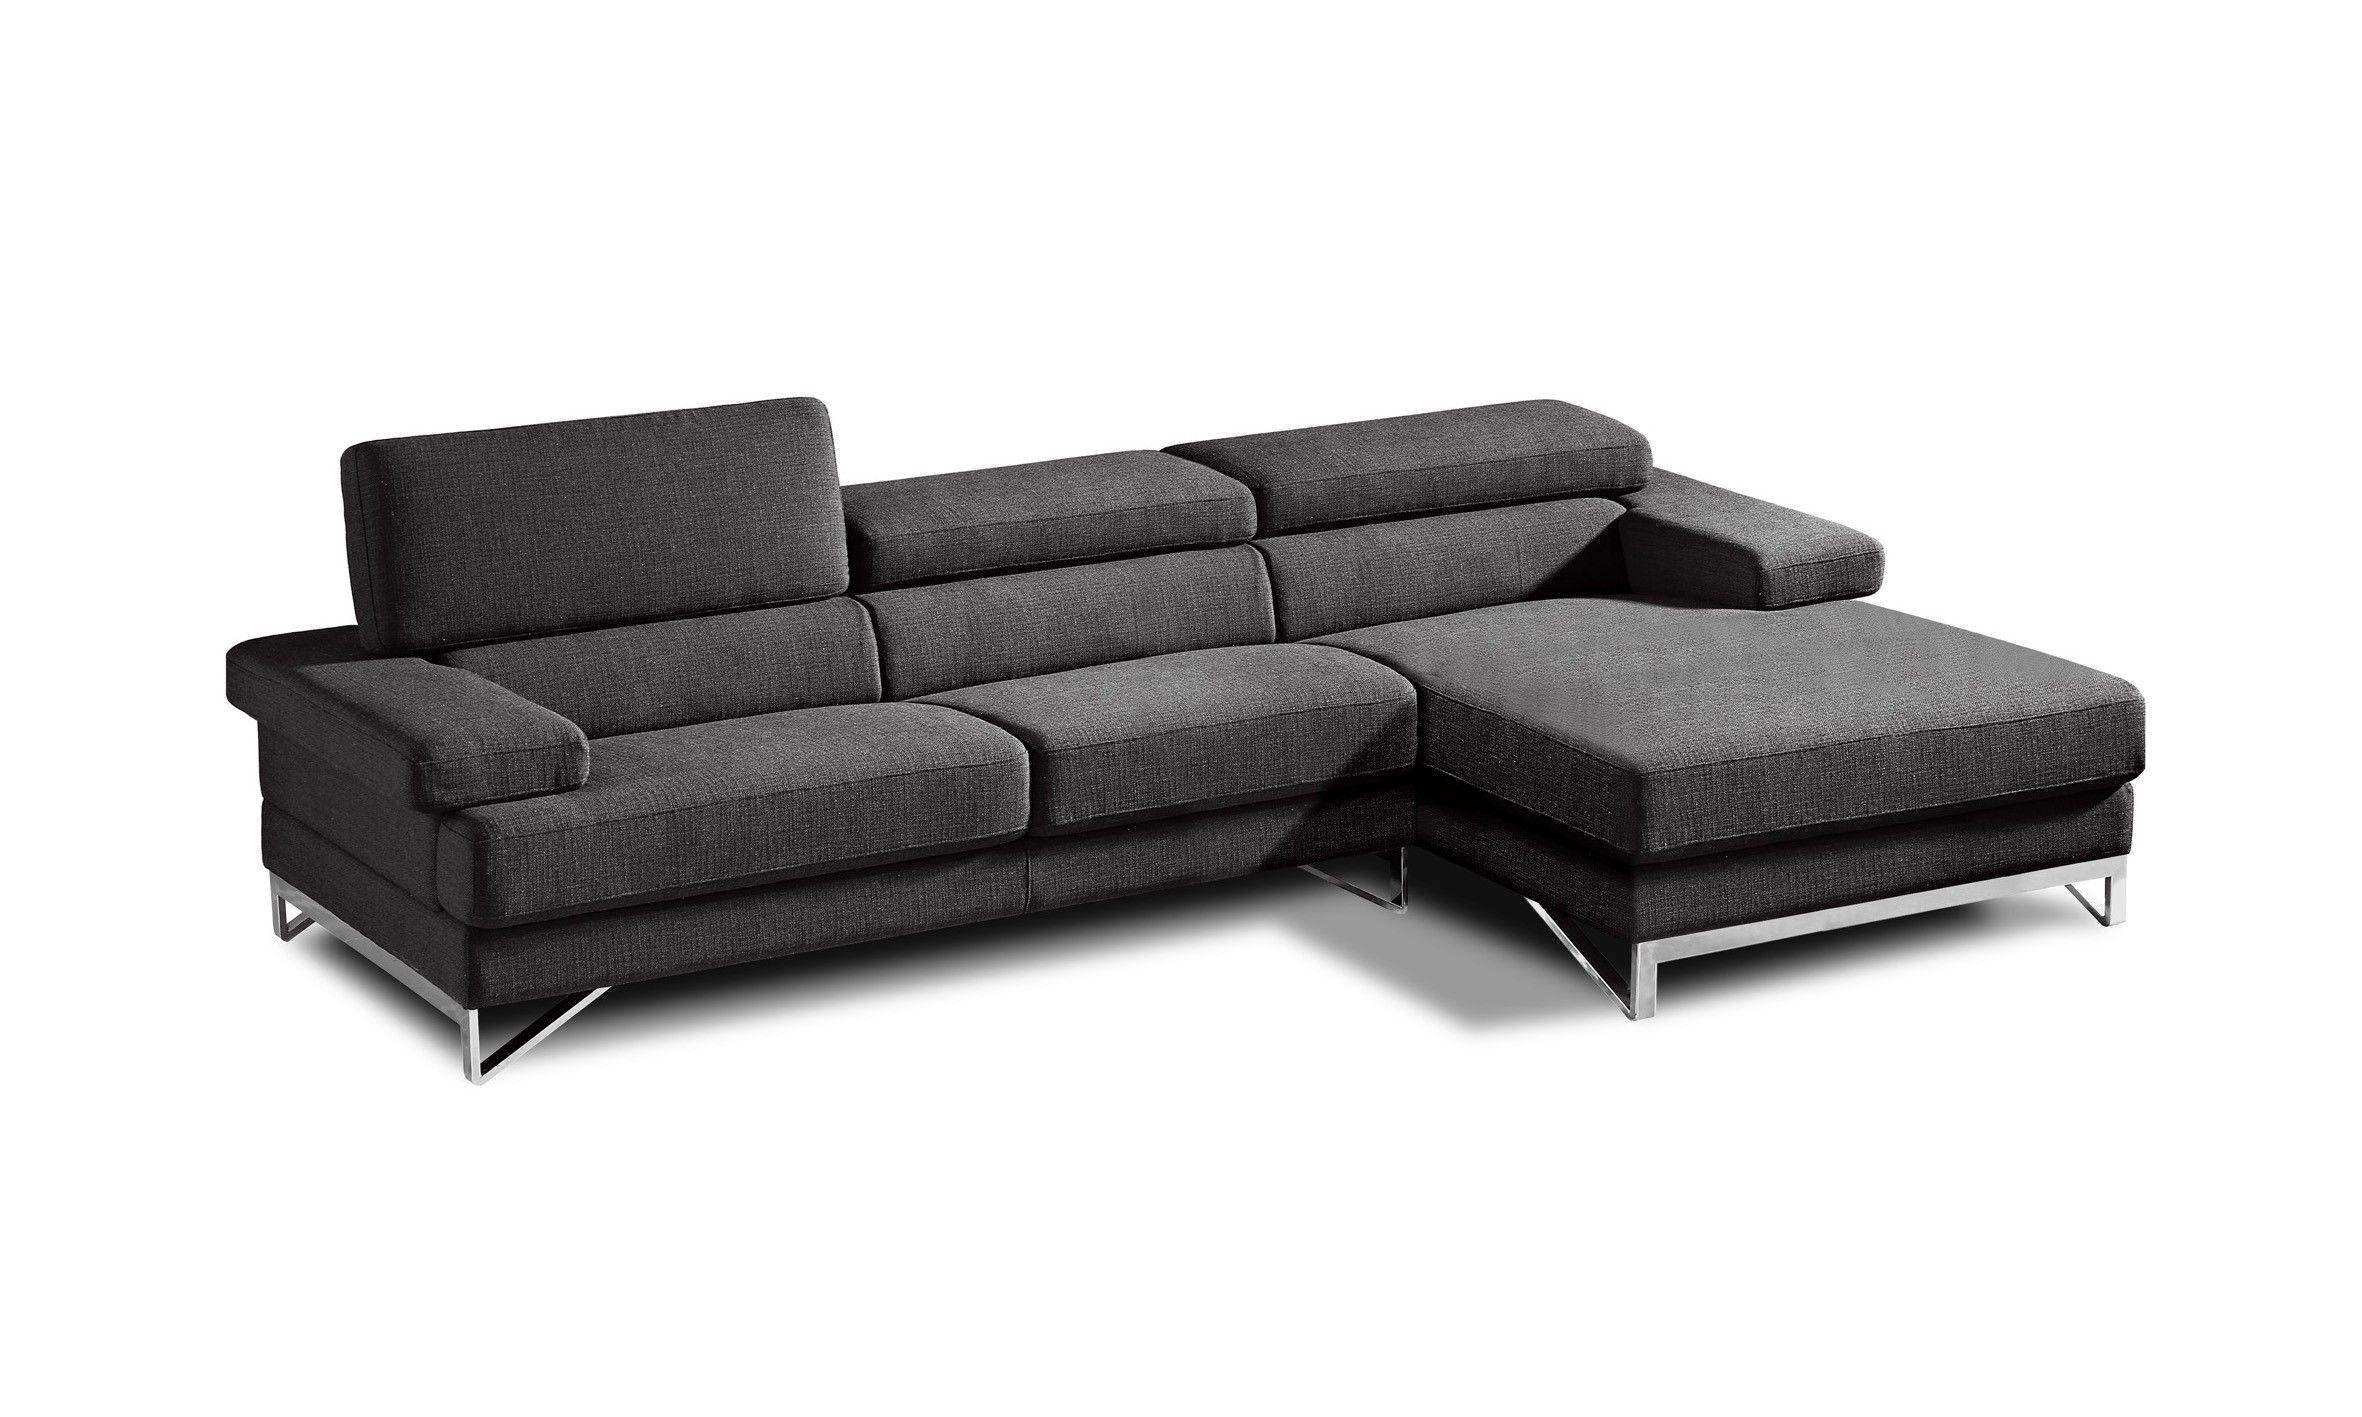 Coburn Modern Grey Fabric Sectional Sofa Modern Fabric Sectional